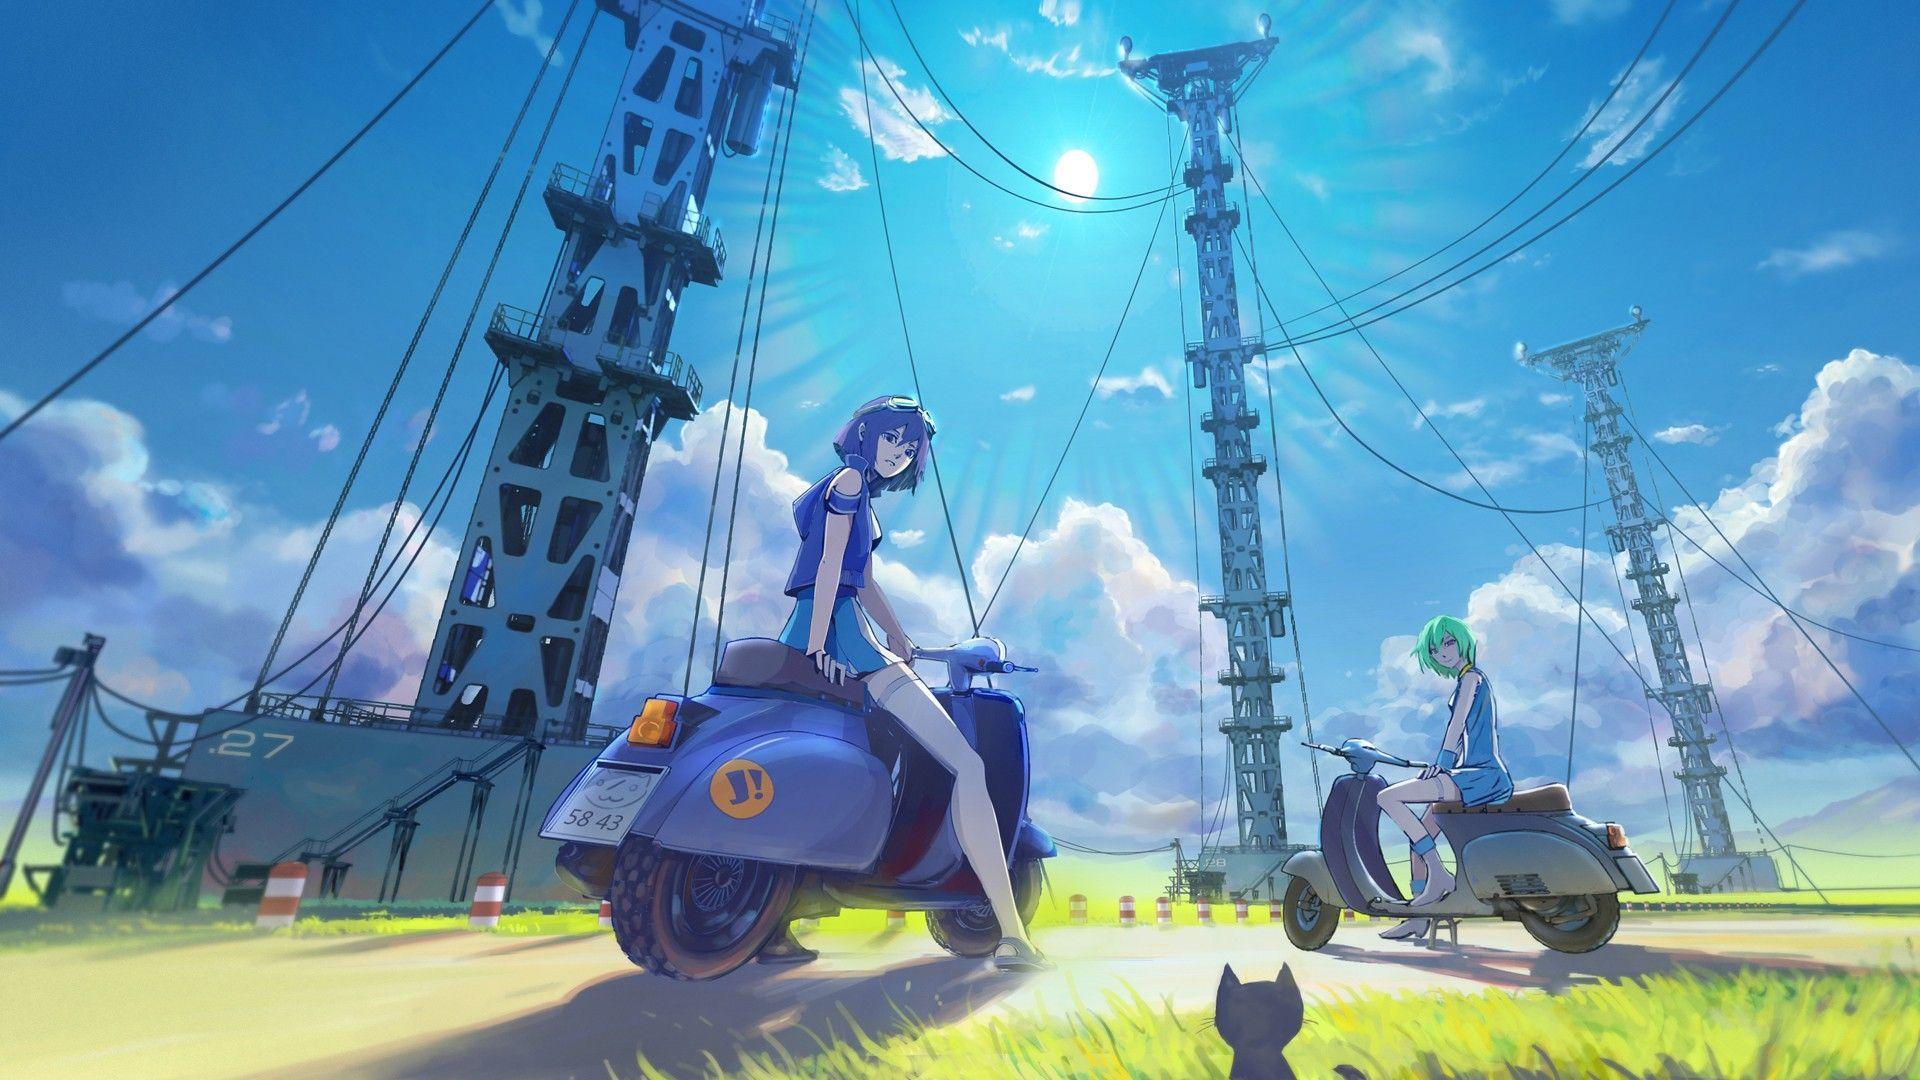 anime scenery wallpaper 1080p